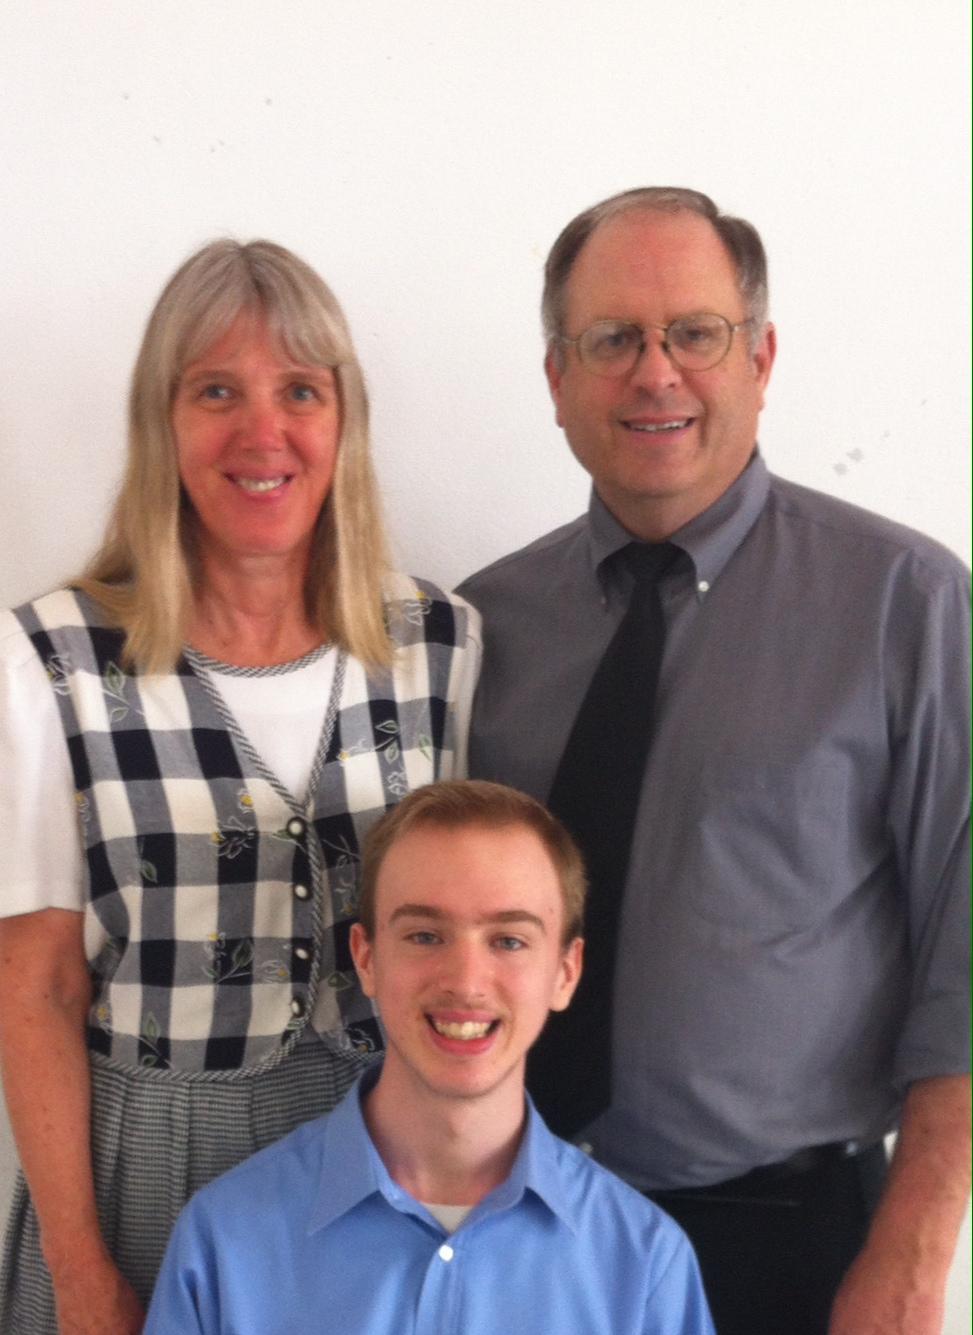 Jeff & Becky Thibaudeau  Baptist World Mission  Brazil